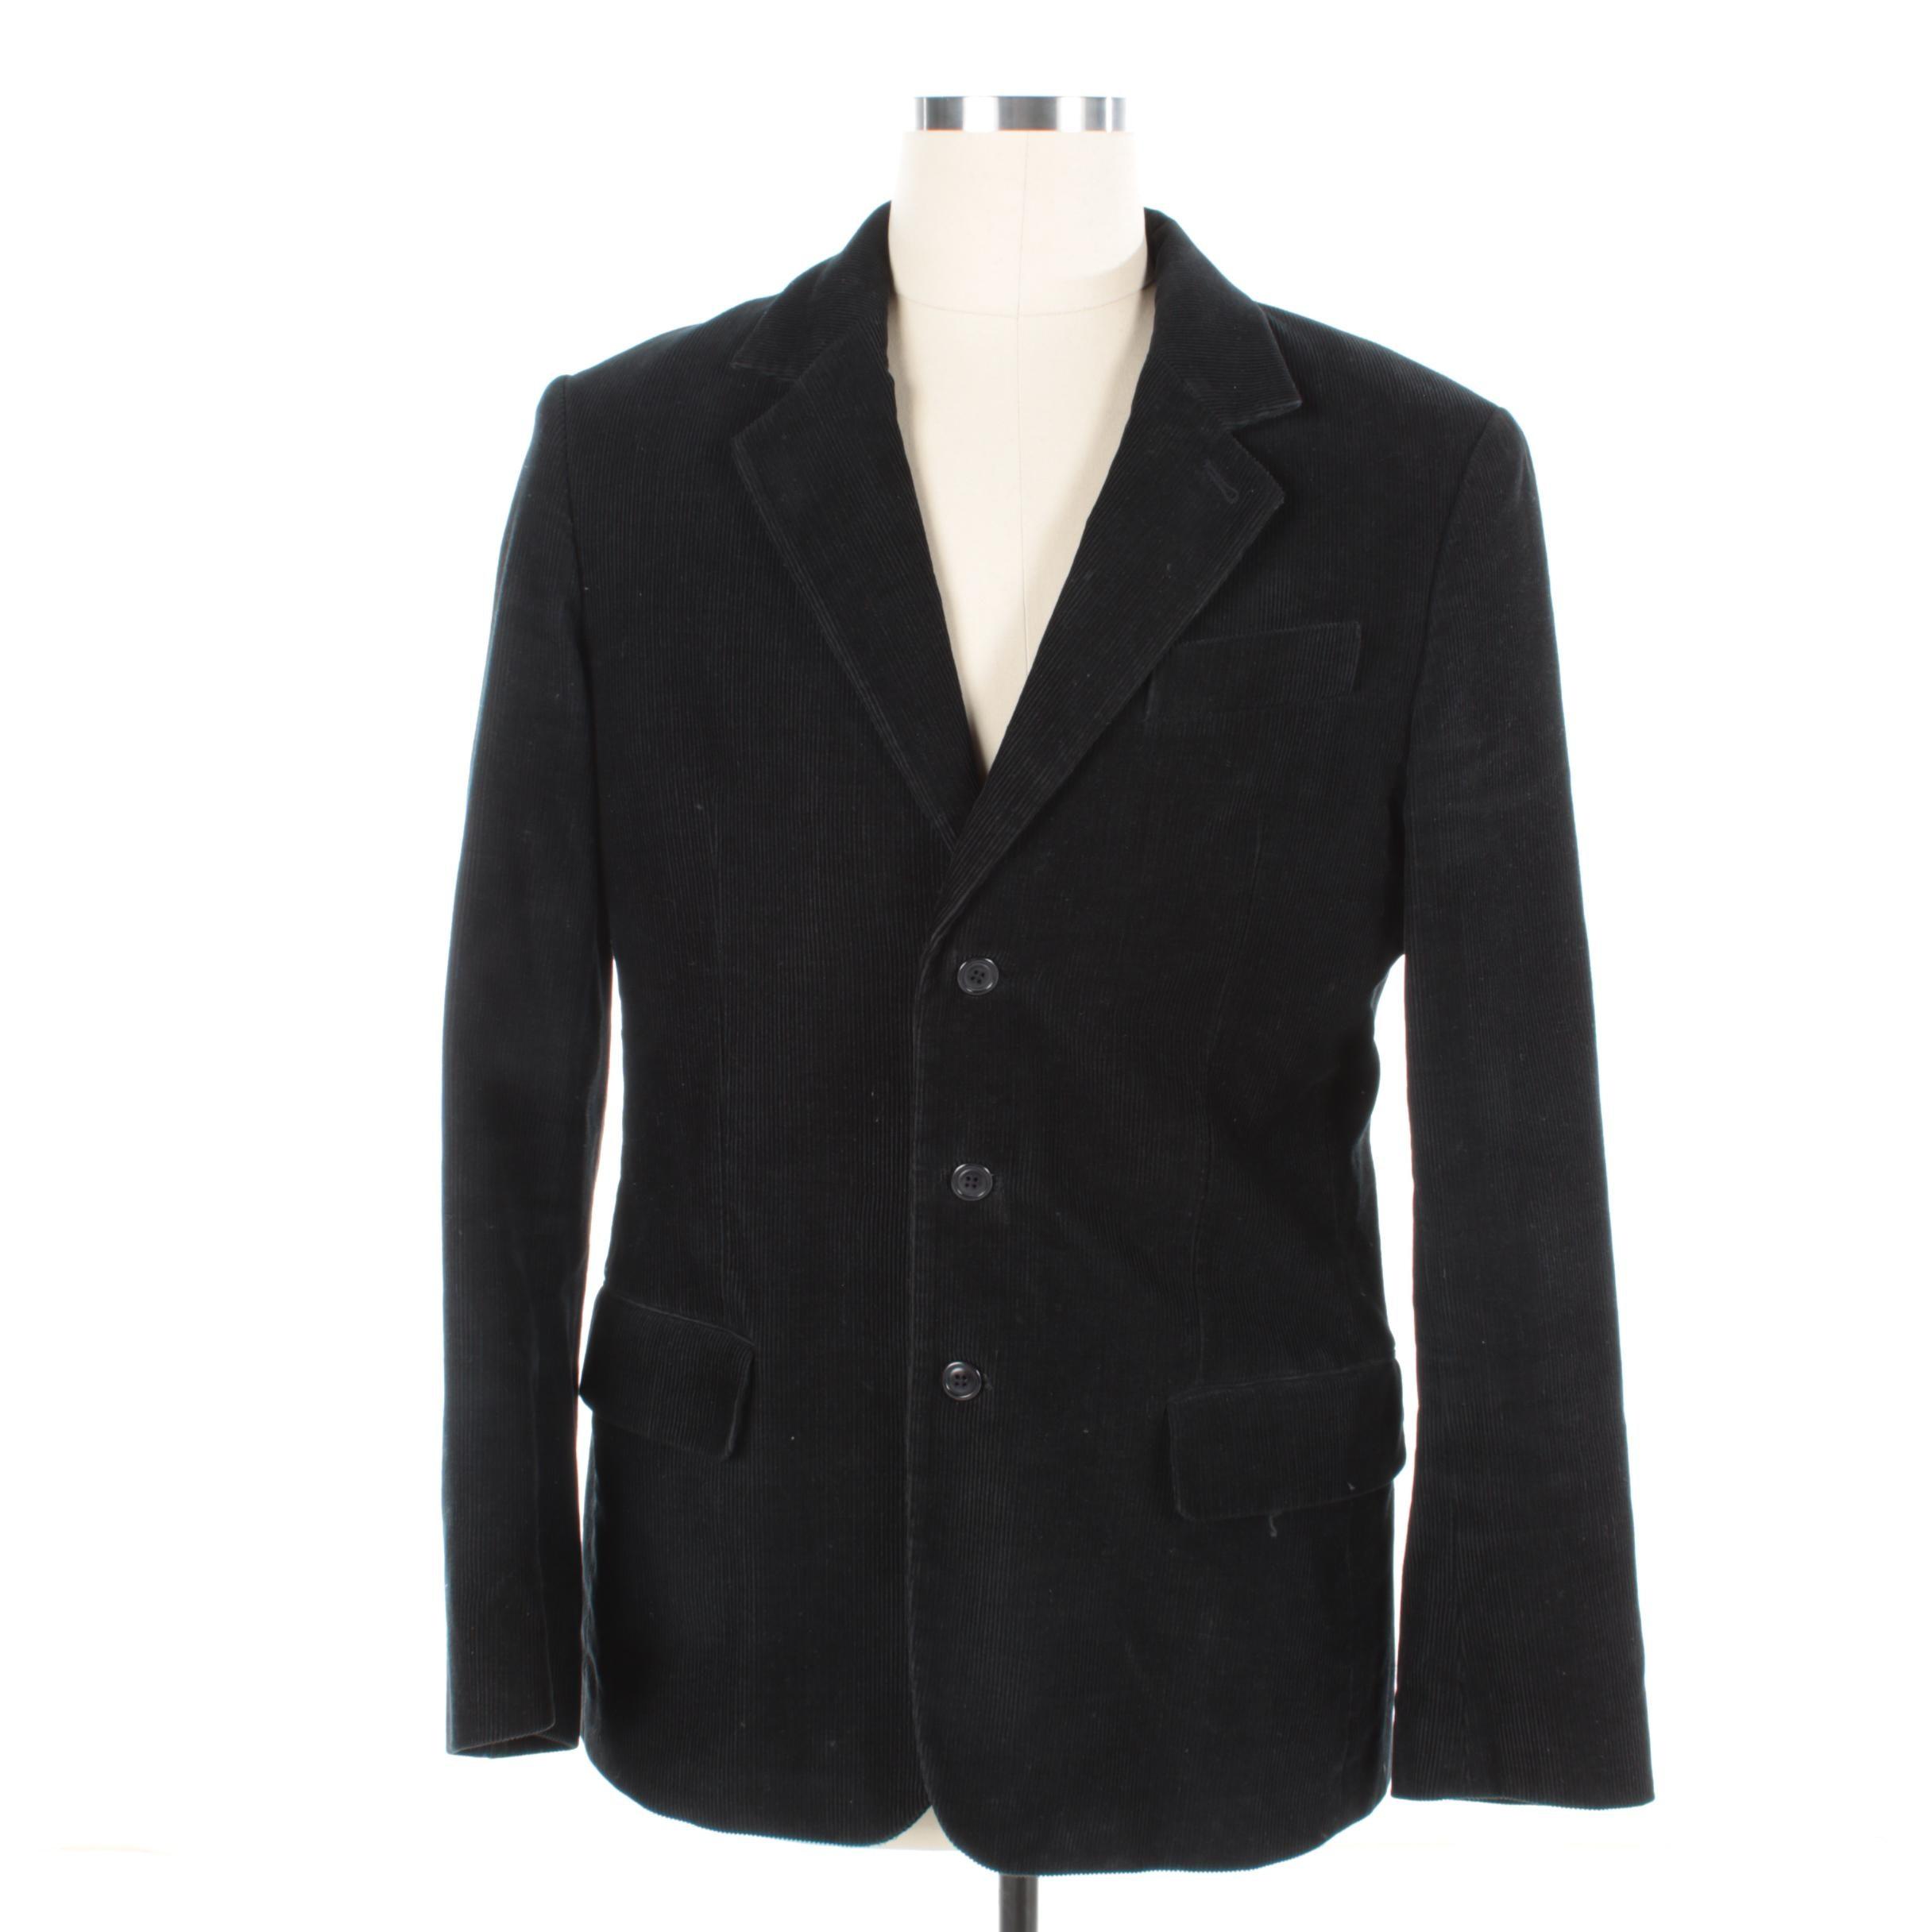 Men's Juicy Couture Black Corduroy Blazer